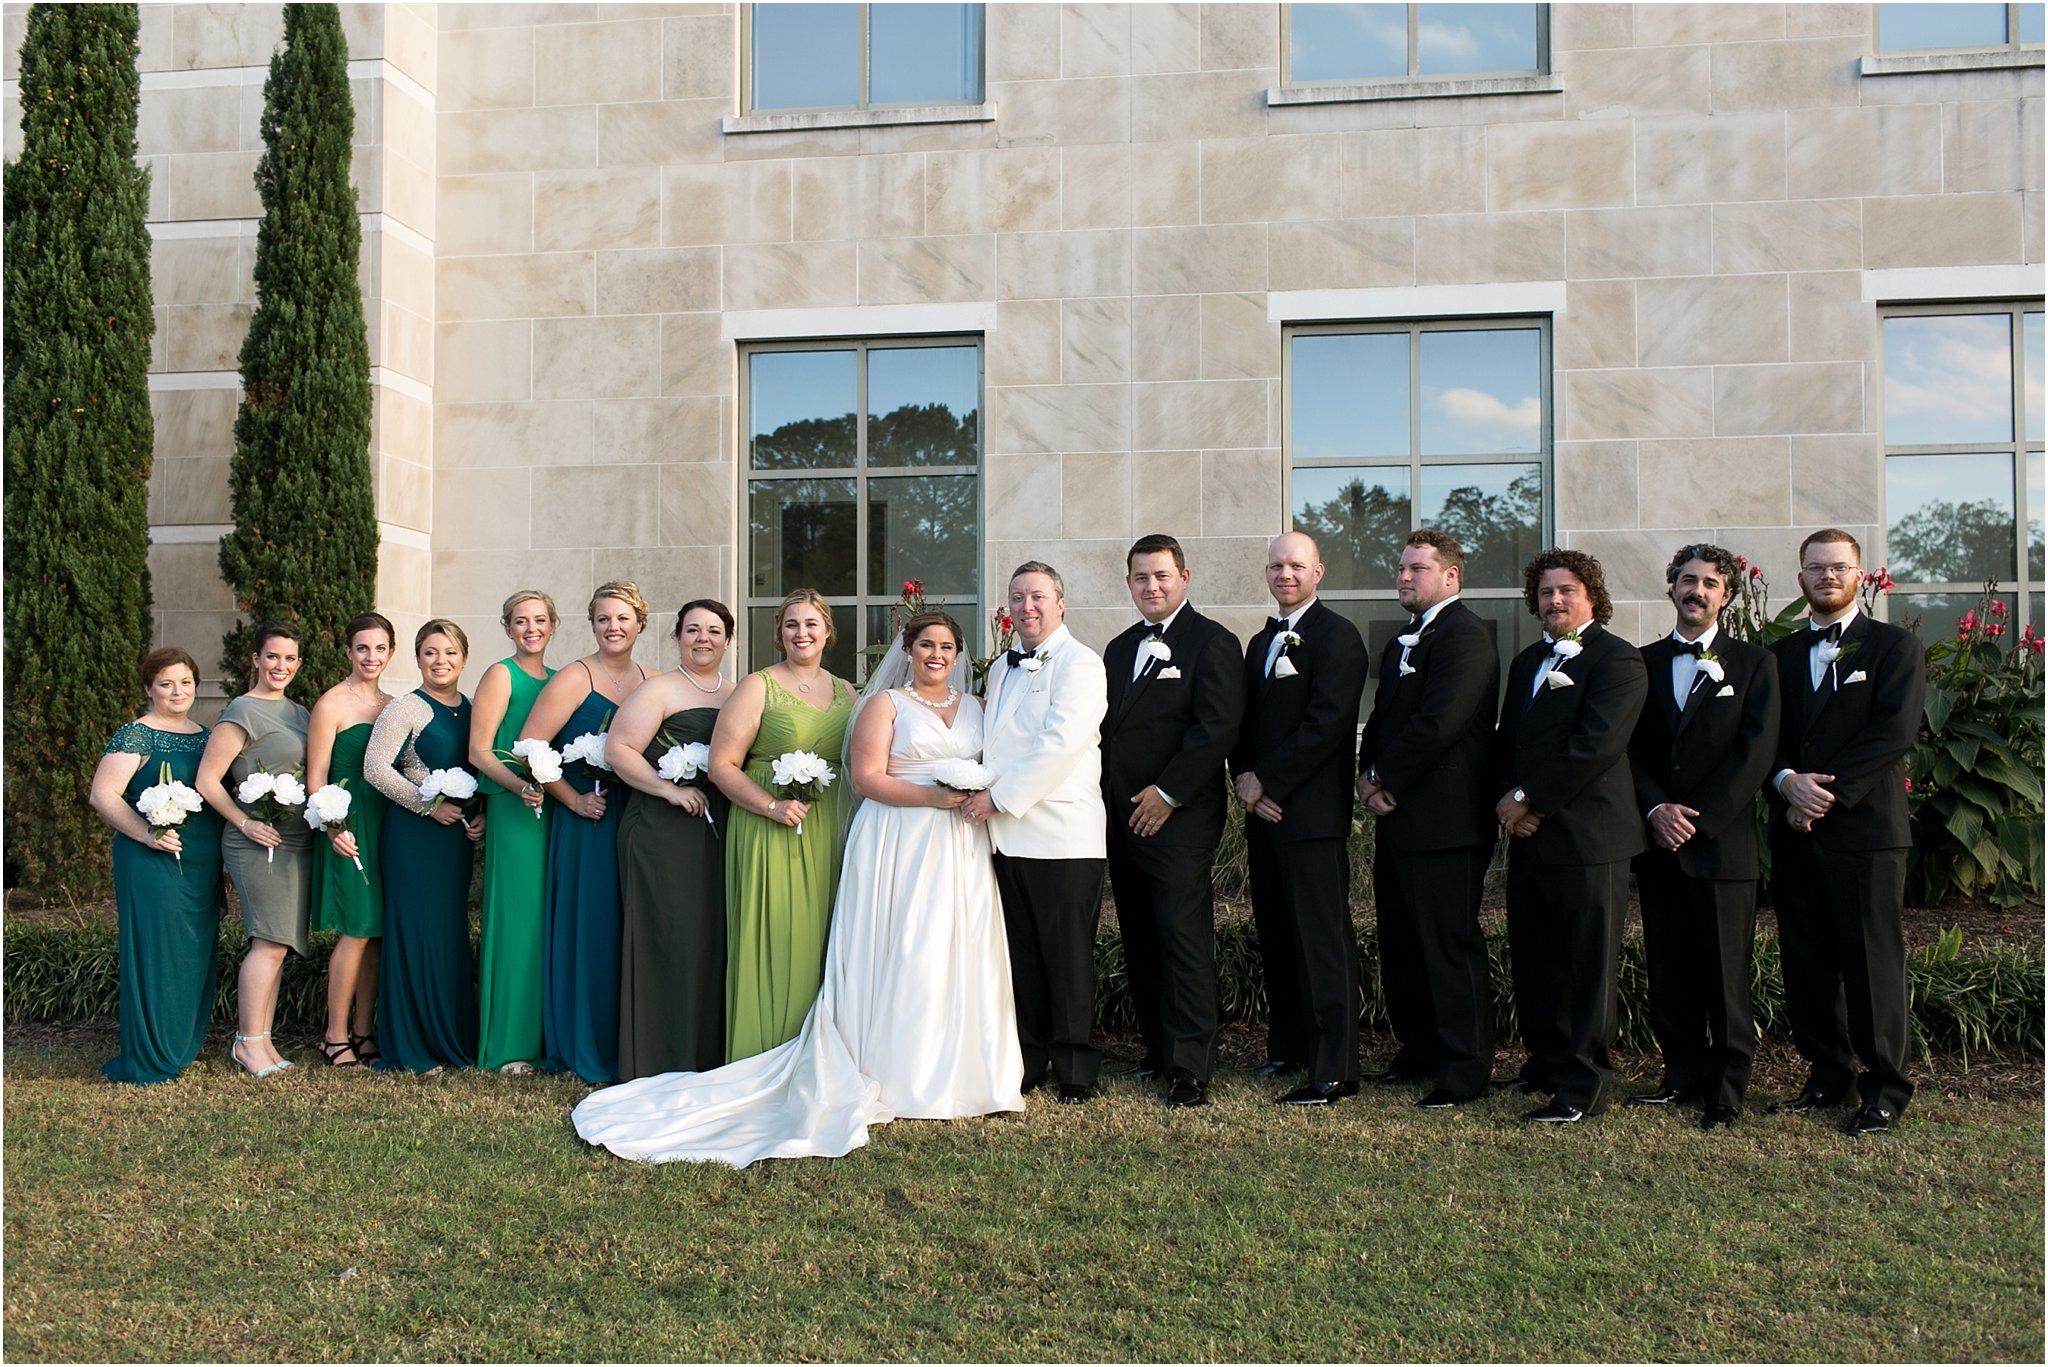 va_jessica_ryan_photography_virginia_wedding_norfolk_harrison_opera_house_norfolk_arts_district_portraits_3795